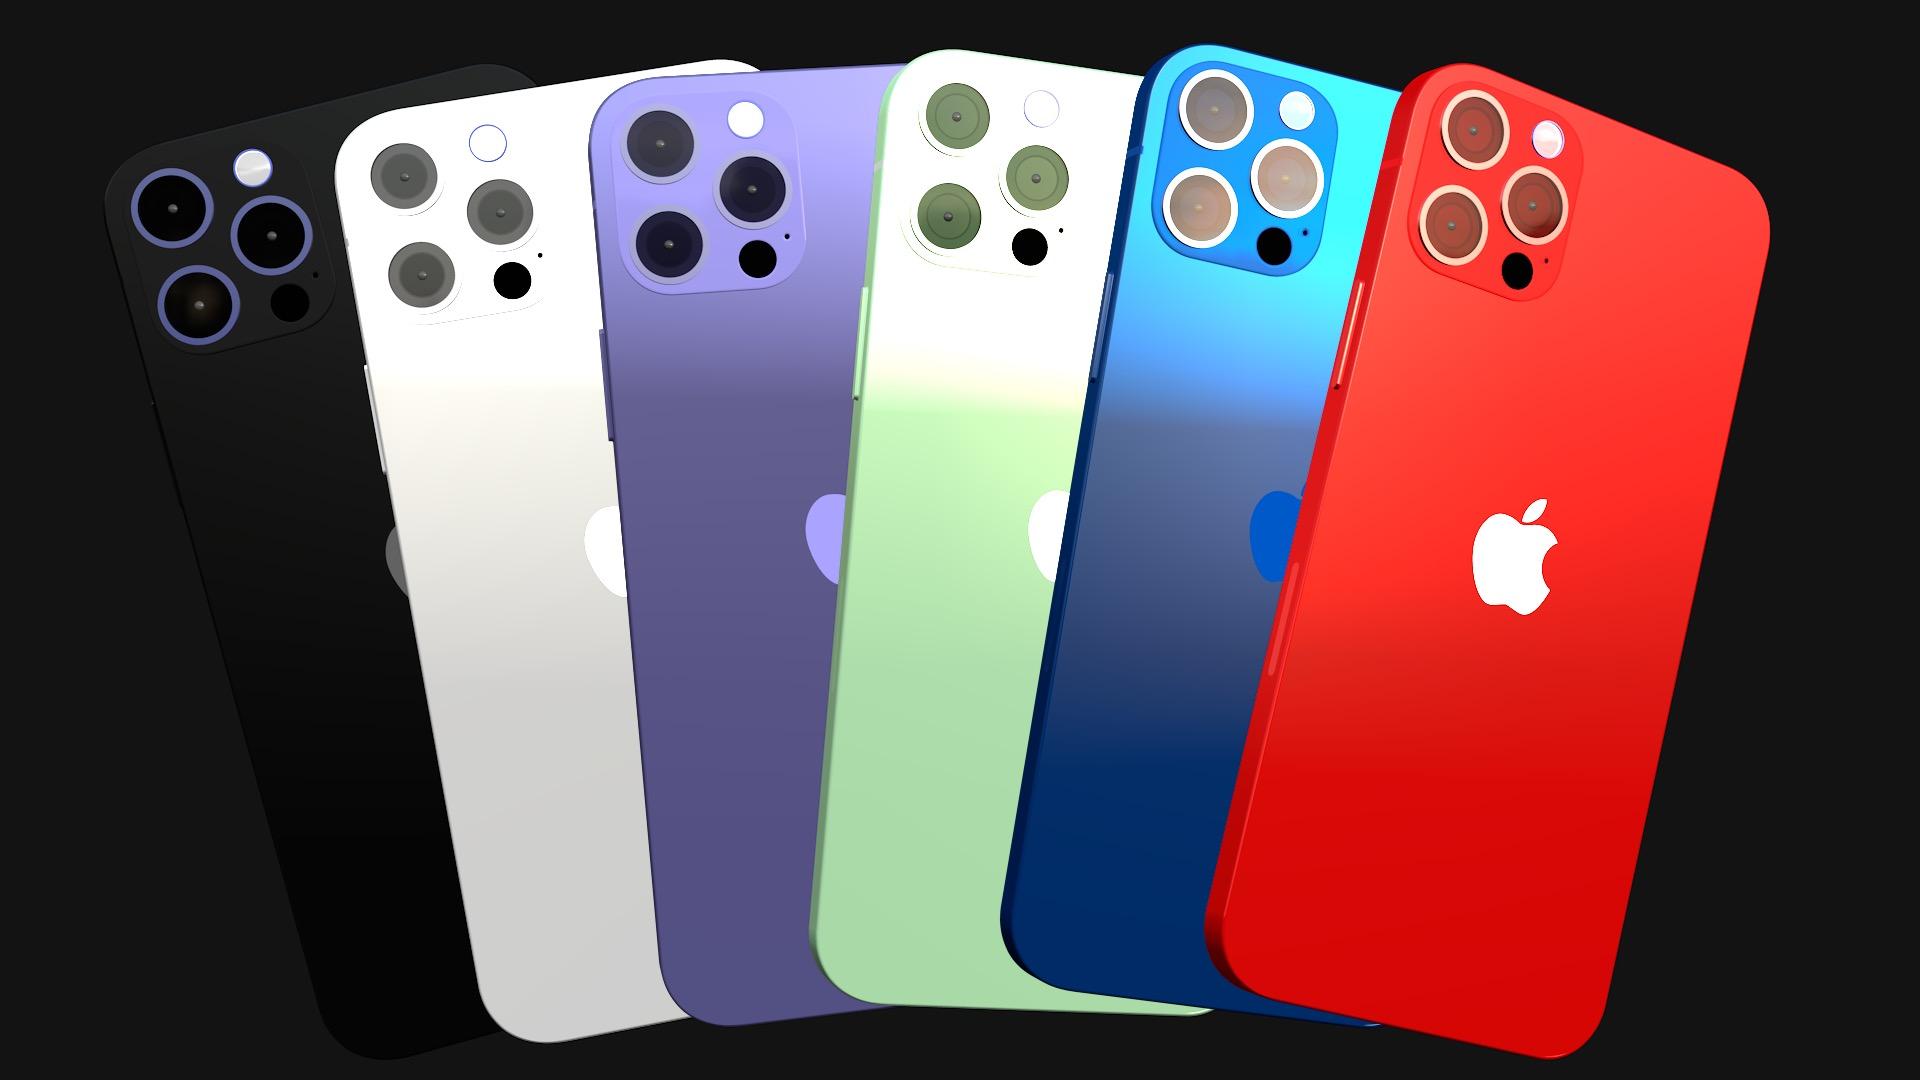 SC iPhone 12 Colors - FCPX effect